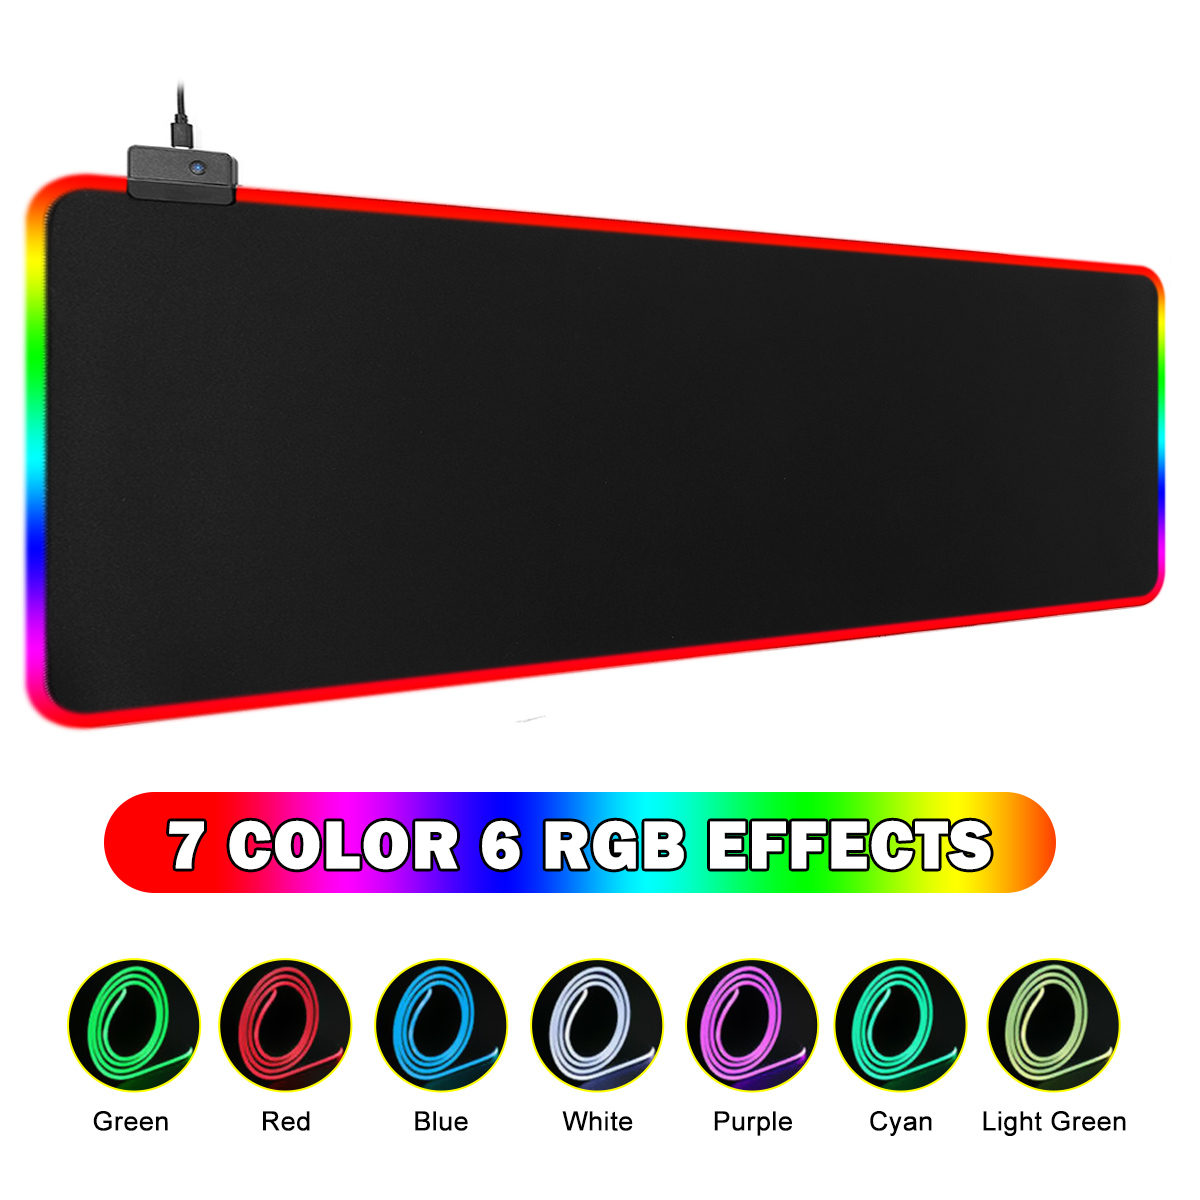 Large Gaming Mouse Pad RGB USB LED Glowing Gamer Keyboard Mousepad Mice Mat 14 Lighting Modes For PC Computer Laptop